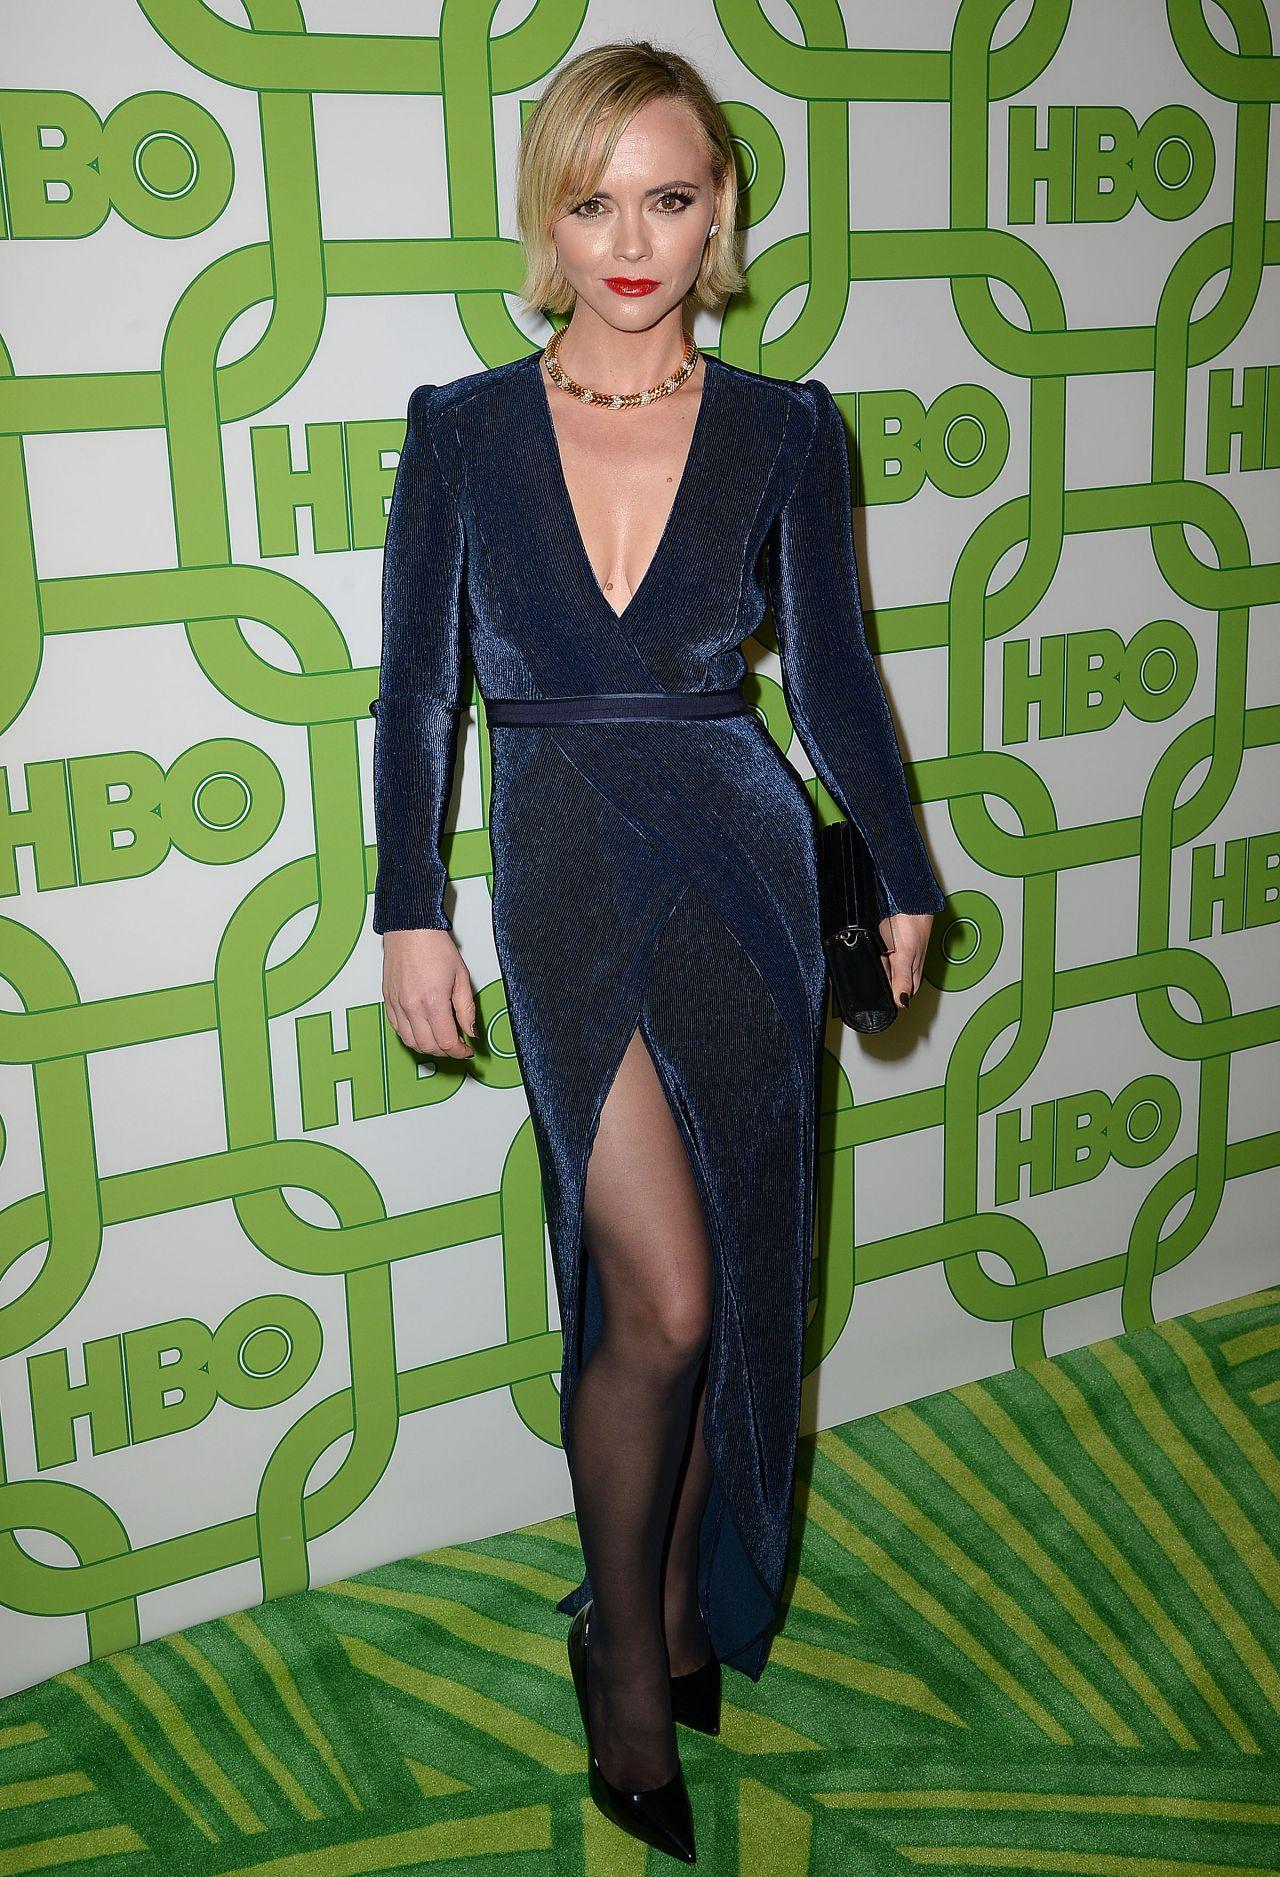 https://celebmafia.com/wp-content/uploads/2019/01/christina-ricci-2019-hbo-official-golden-globe-awards-after-party-8.jpg